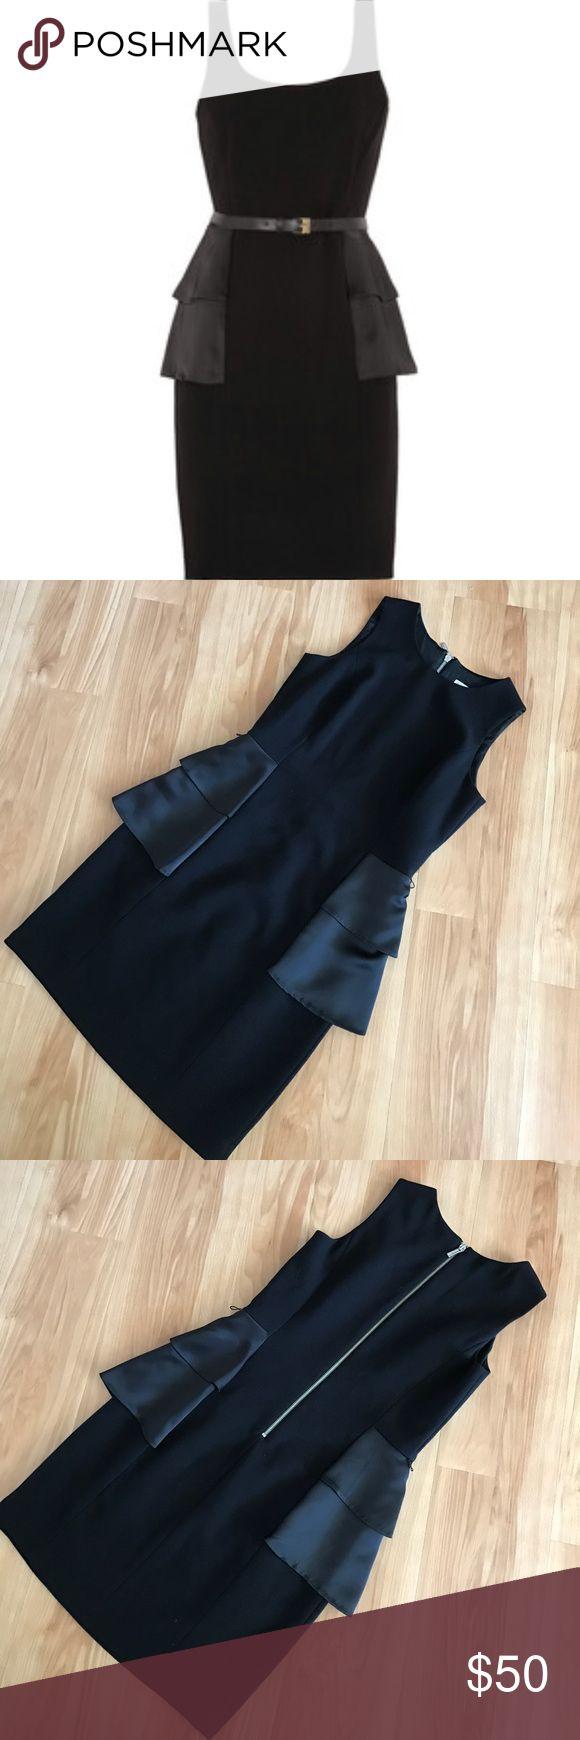 Michael Kors black peplum dress Super chic MICHAEL Michael Kors peplum dress. Has silver zipper down the back. Peplum sides are satin unlike rest of dress. *Belt is not included* Michael Kors Dresses